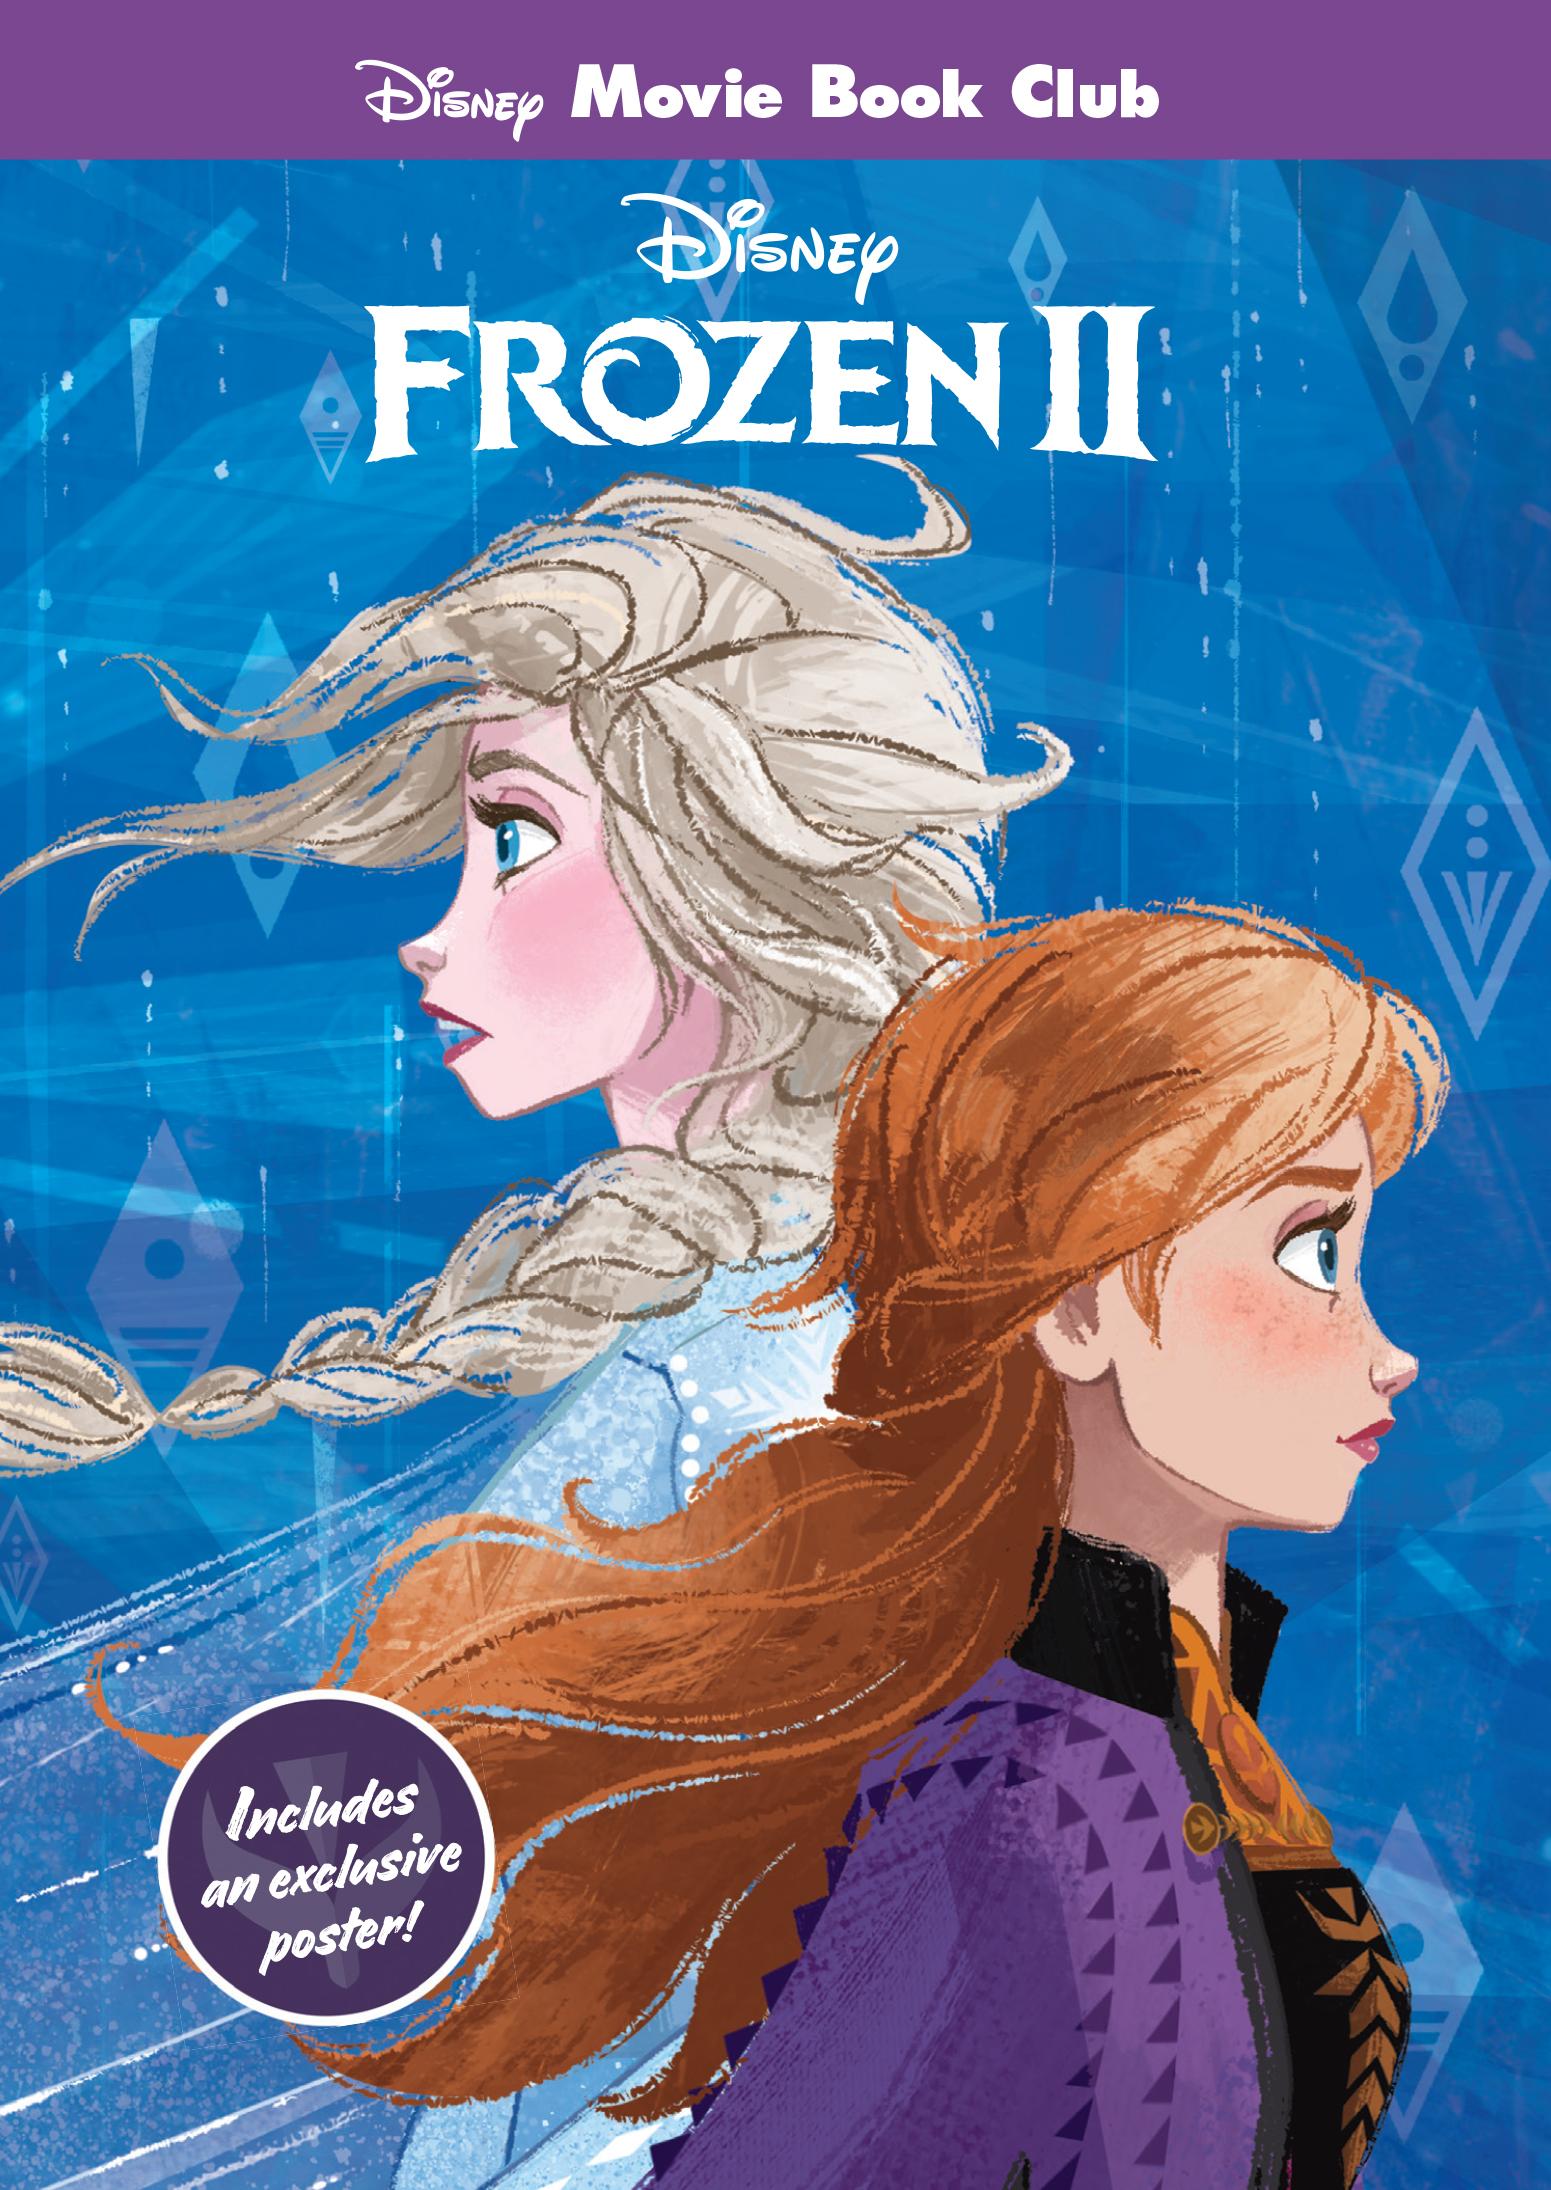 Disney Movie Book Club: Frozen II